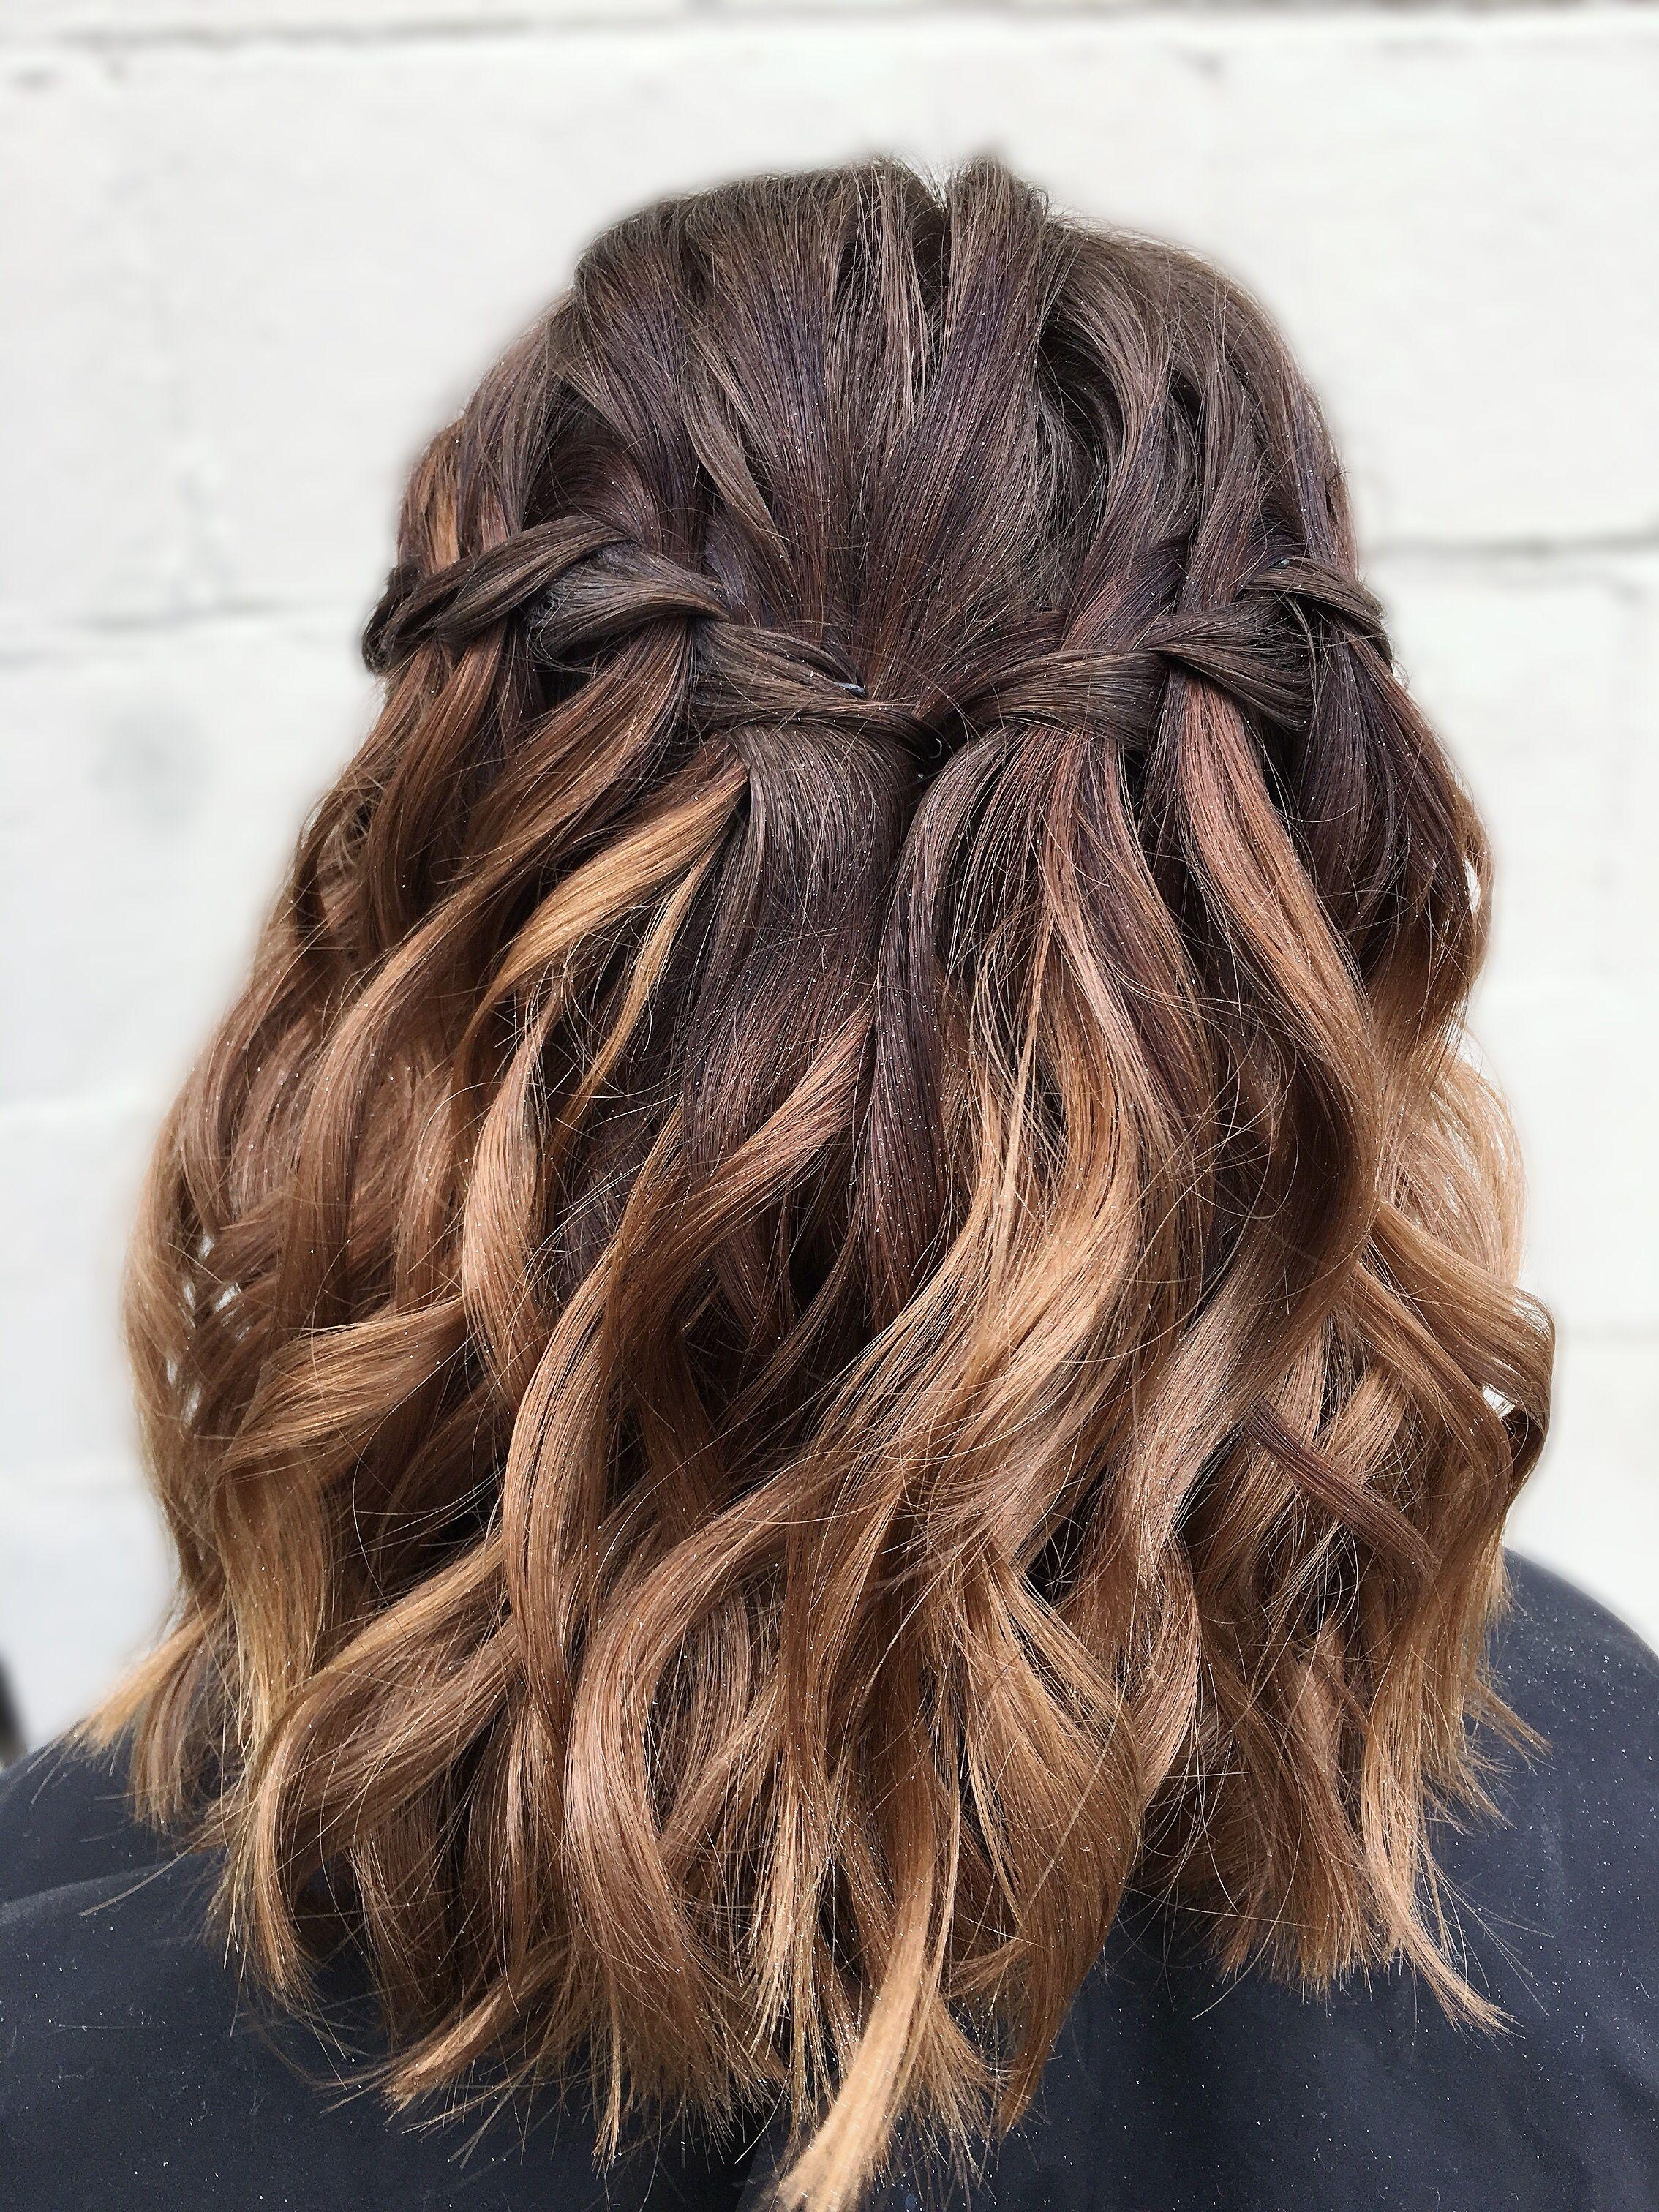 Prom Do Lob Hairstyle Hair Styles Goddess Braids Hairstyles